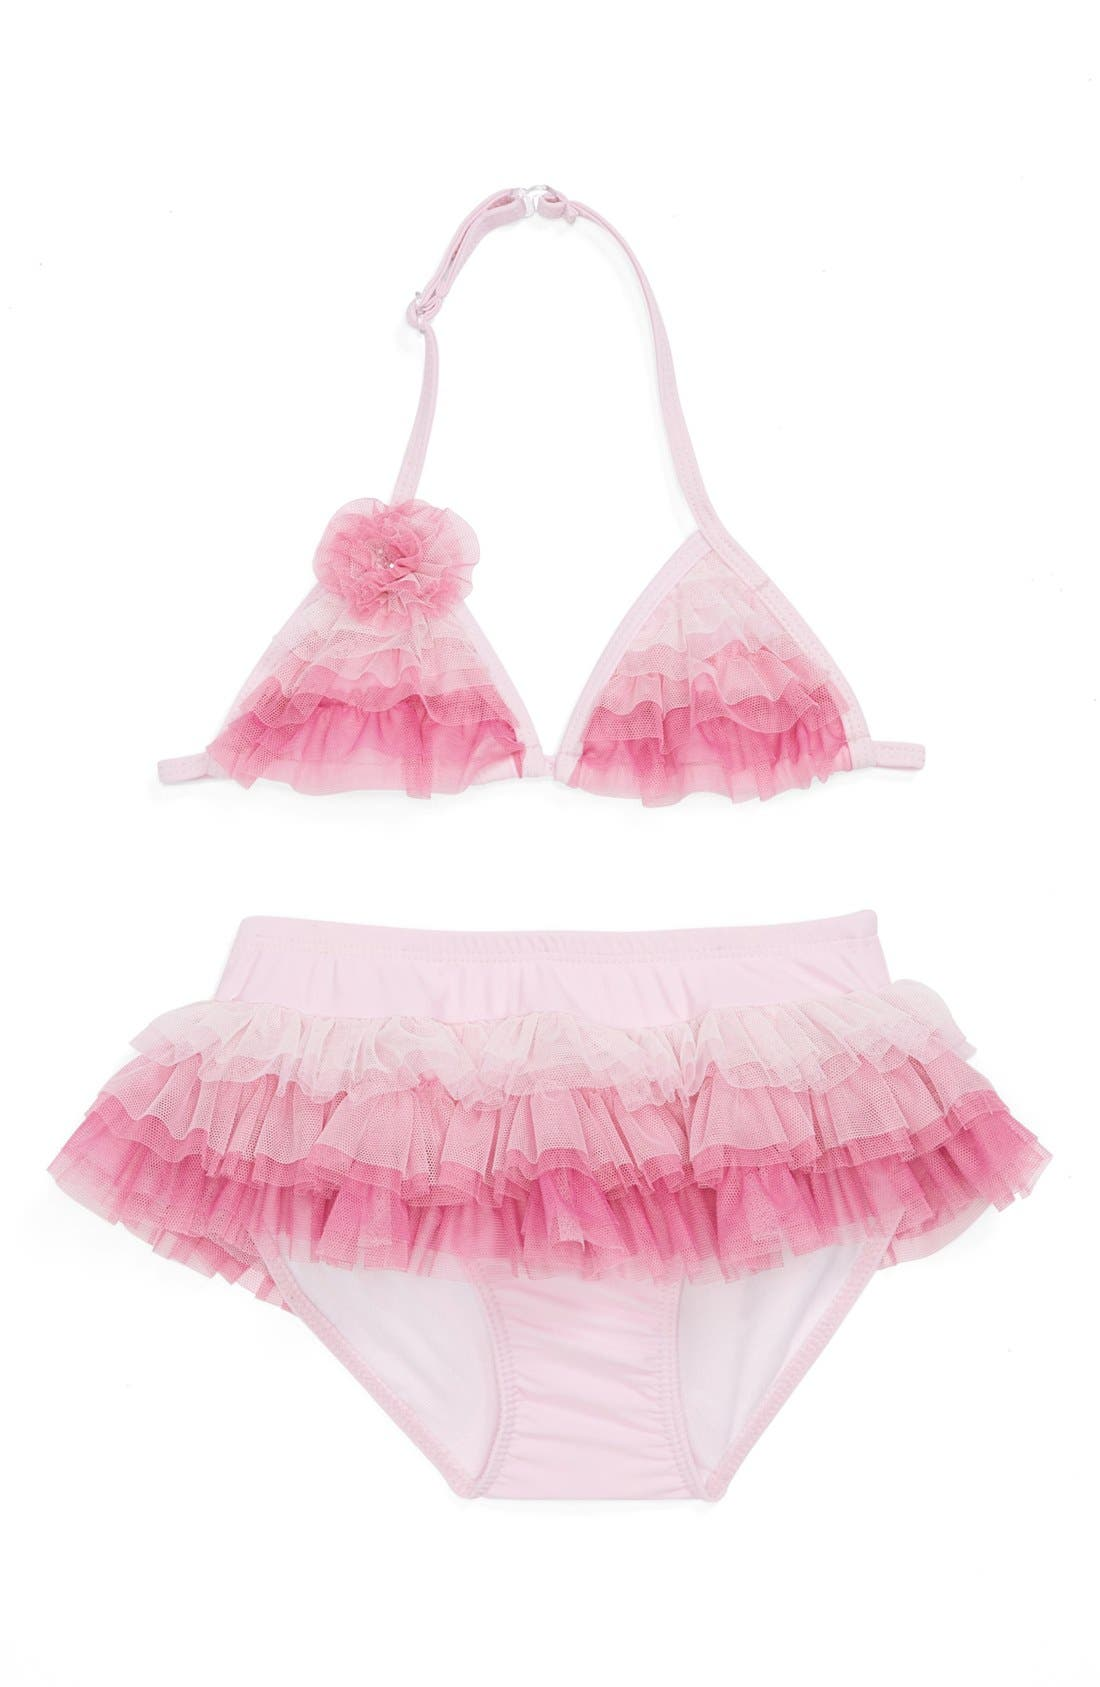 Alternate Image 1 Selected - Isobella & Chloe Two-Piece Swimsuit (Little Girls)